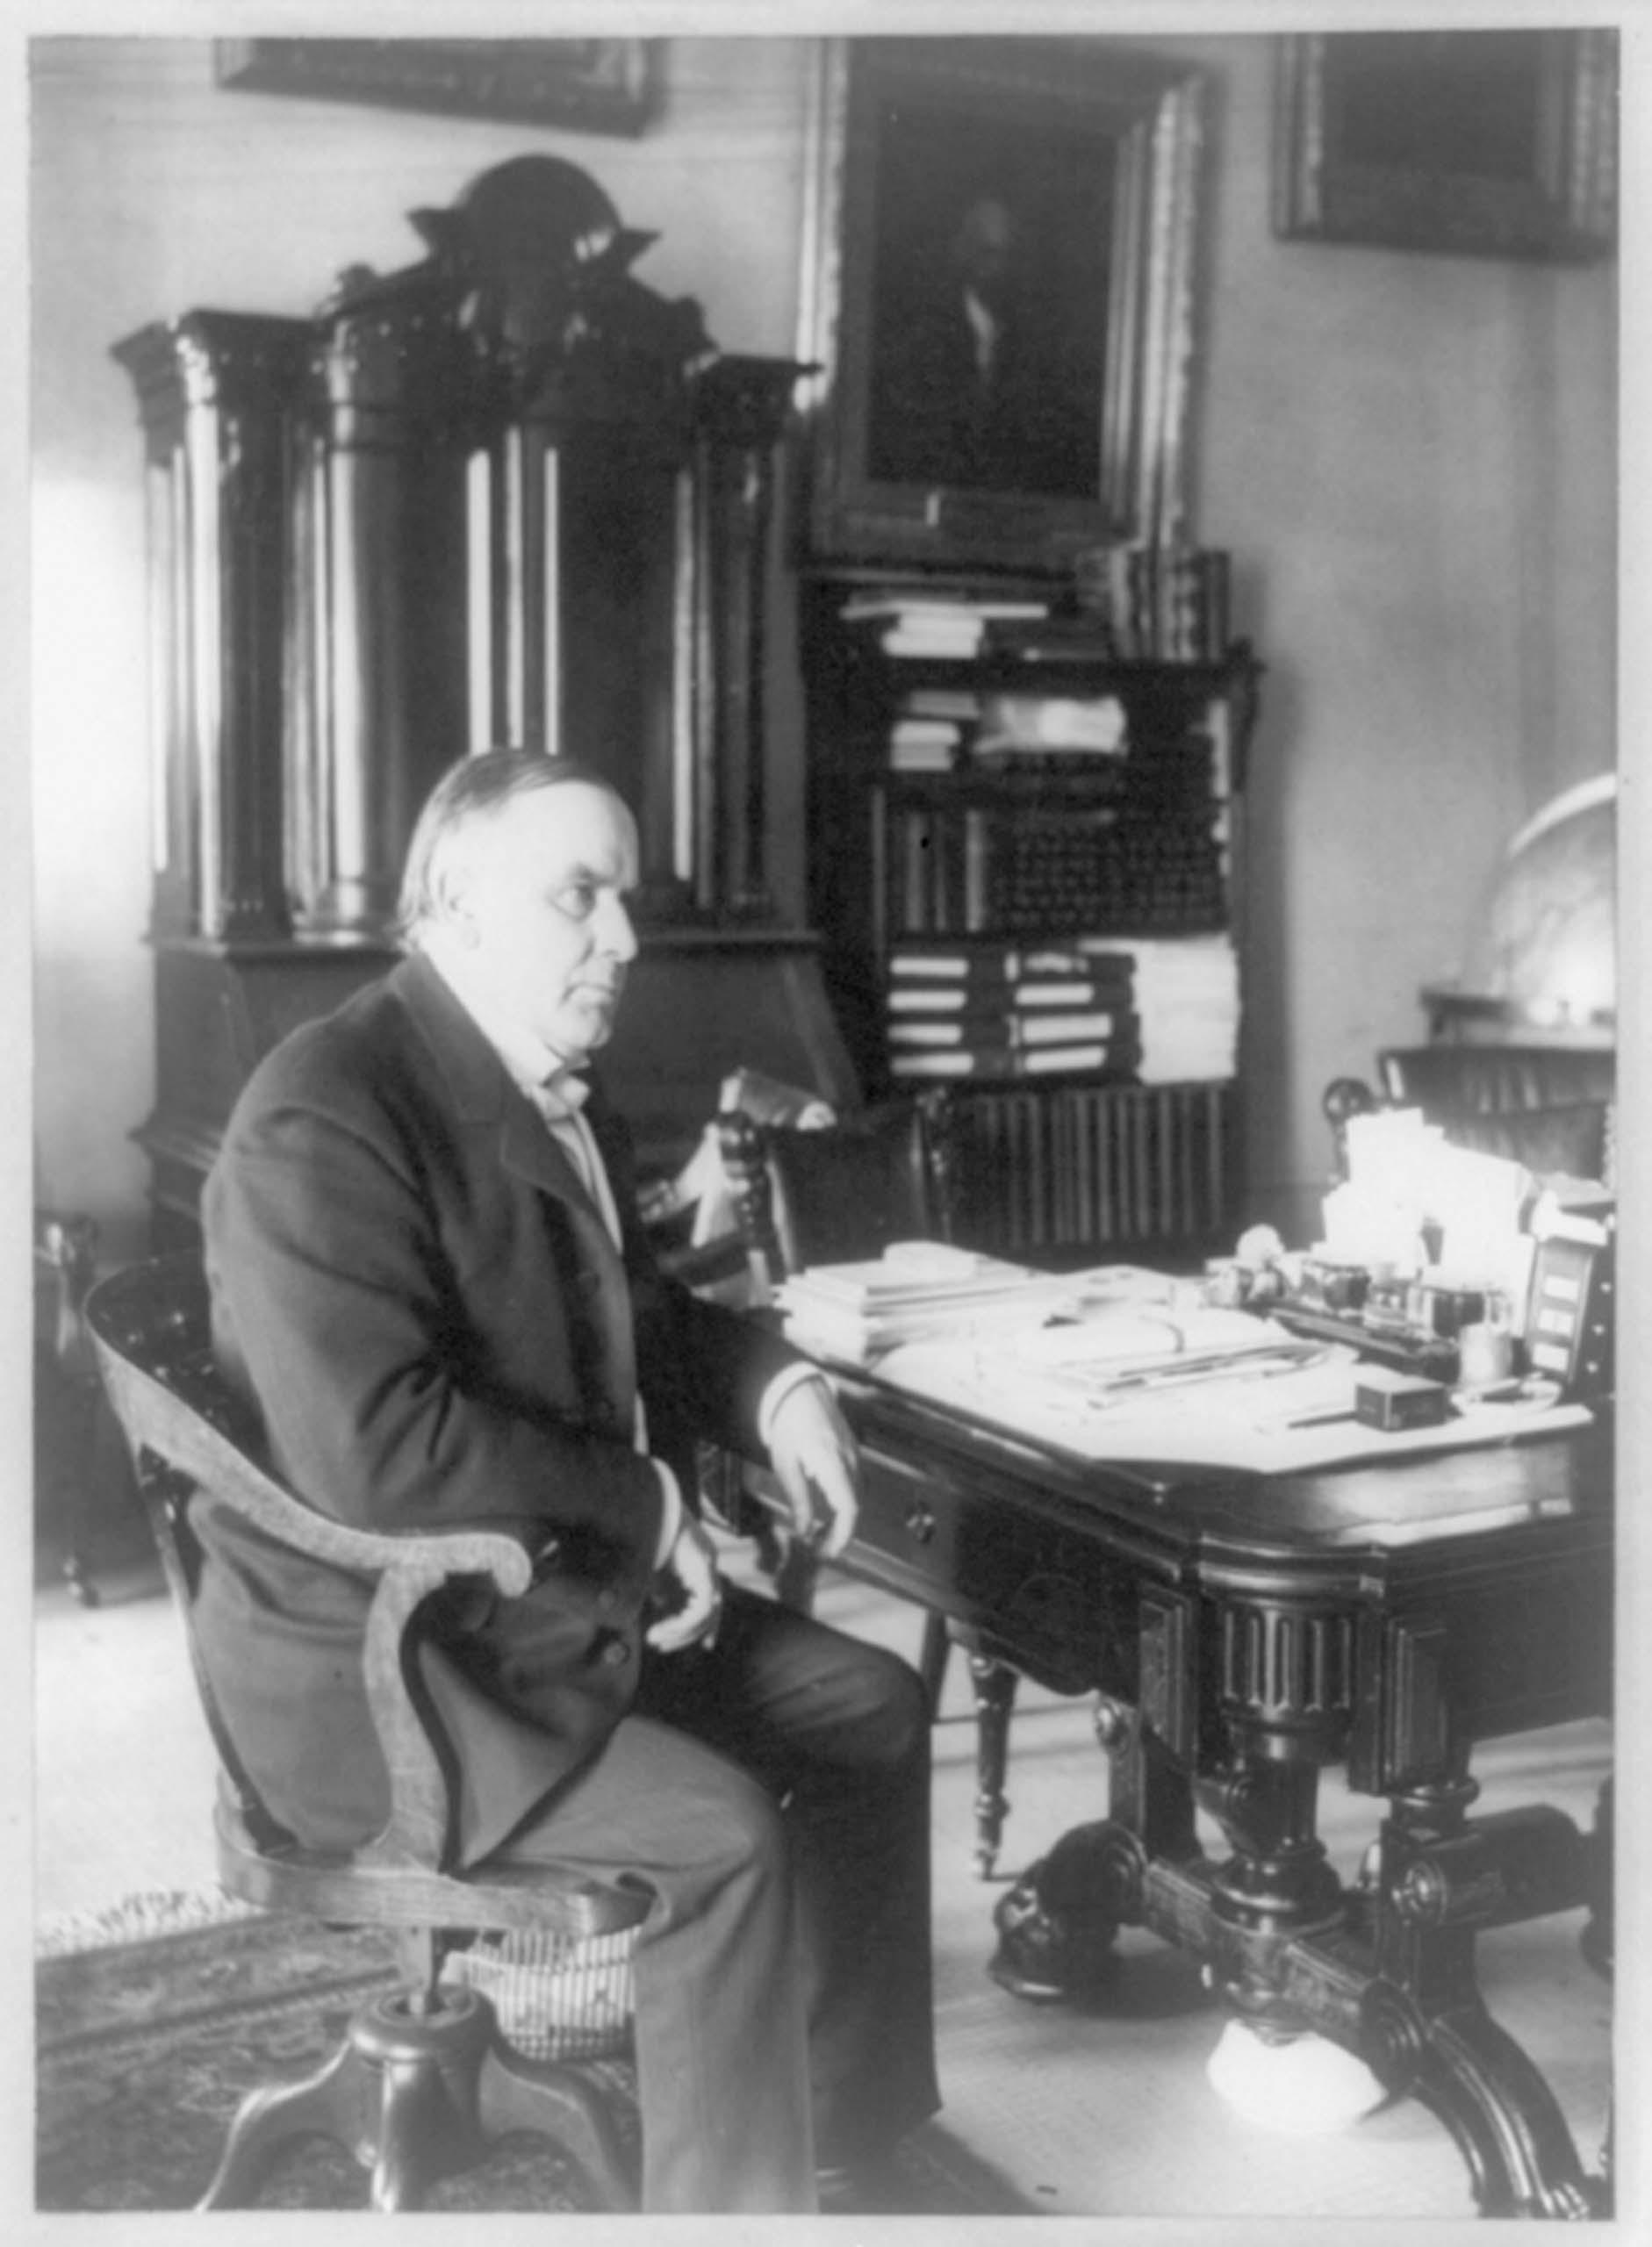 c. June 7, 1898. William McKinley, full length portrait, seated at desk, facing right.